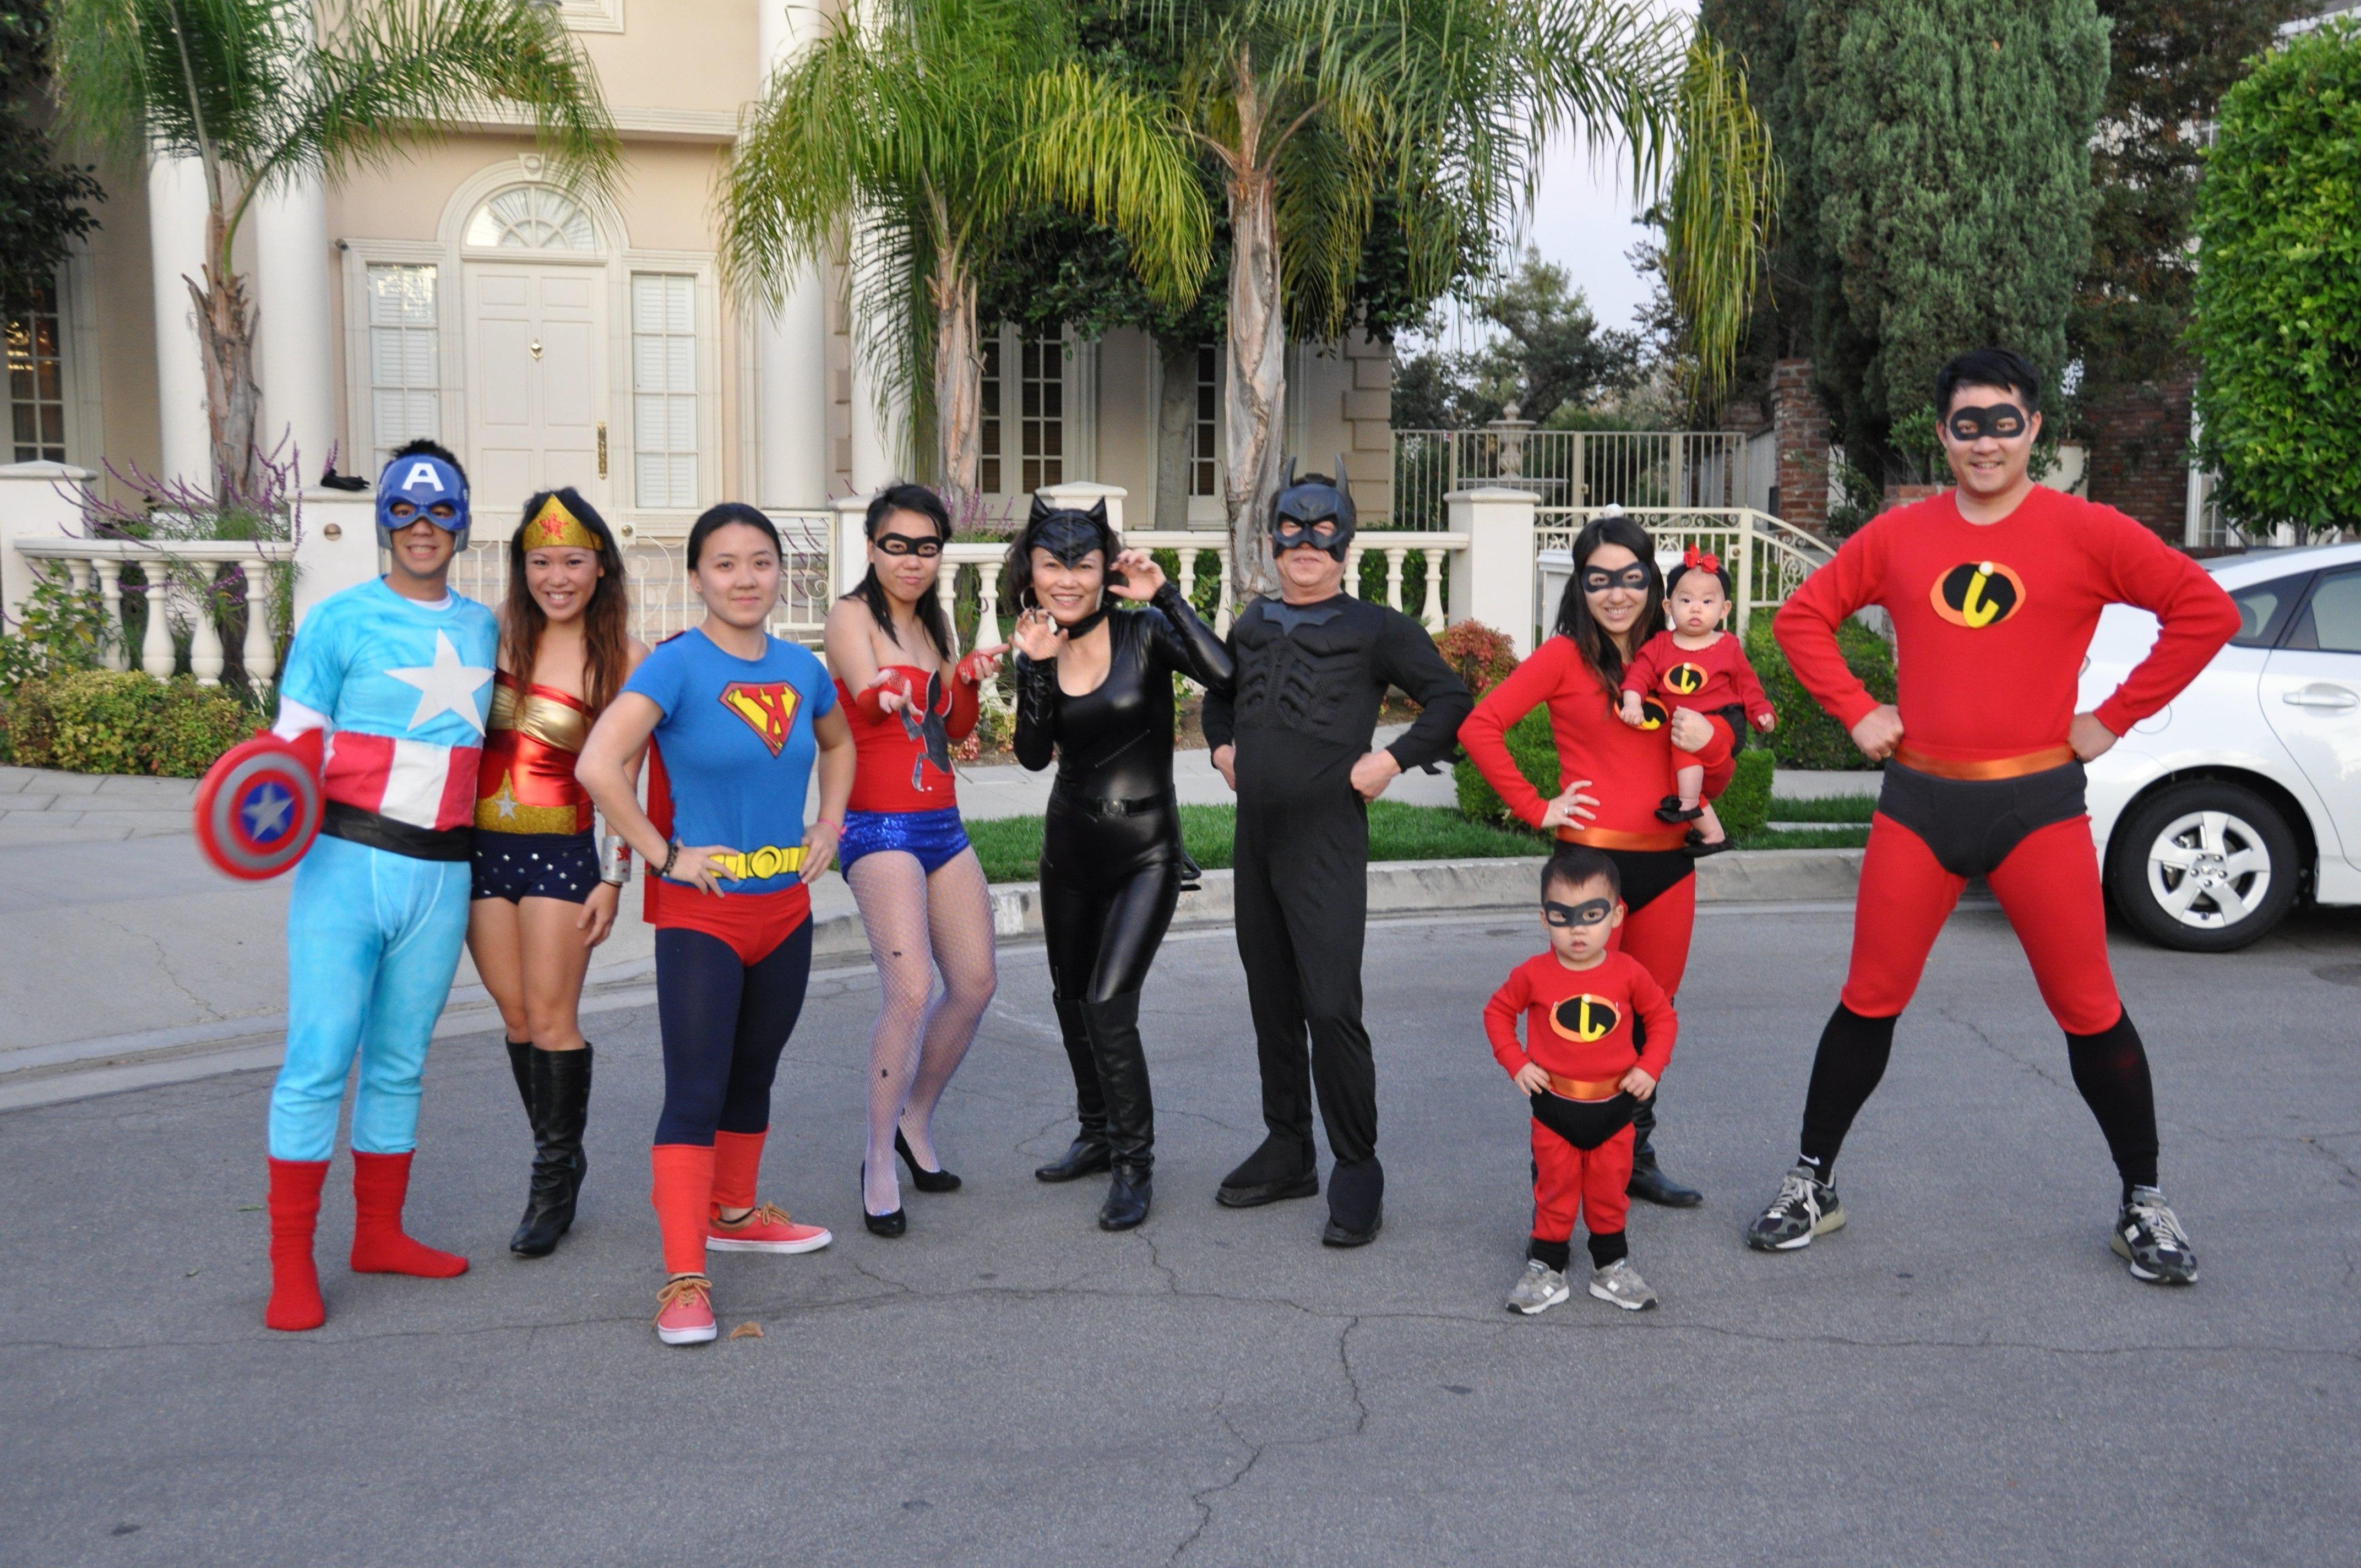 Kostüm Superhelden selber machen DIY Ideen